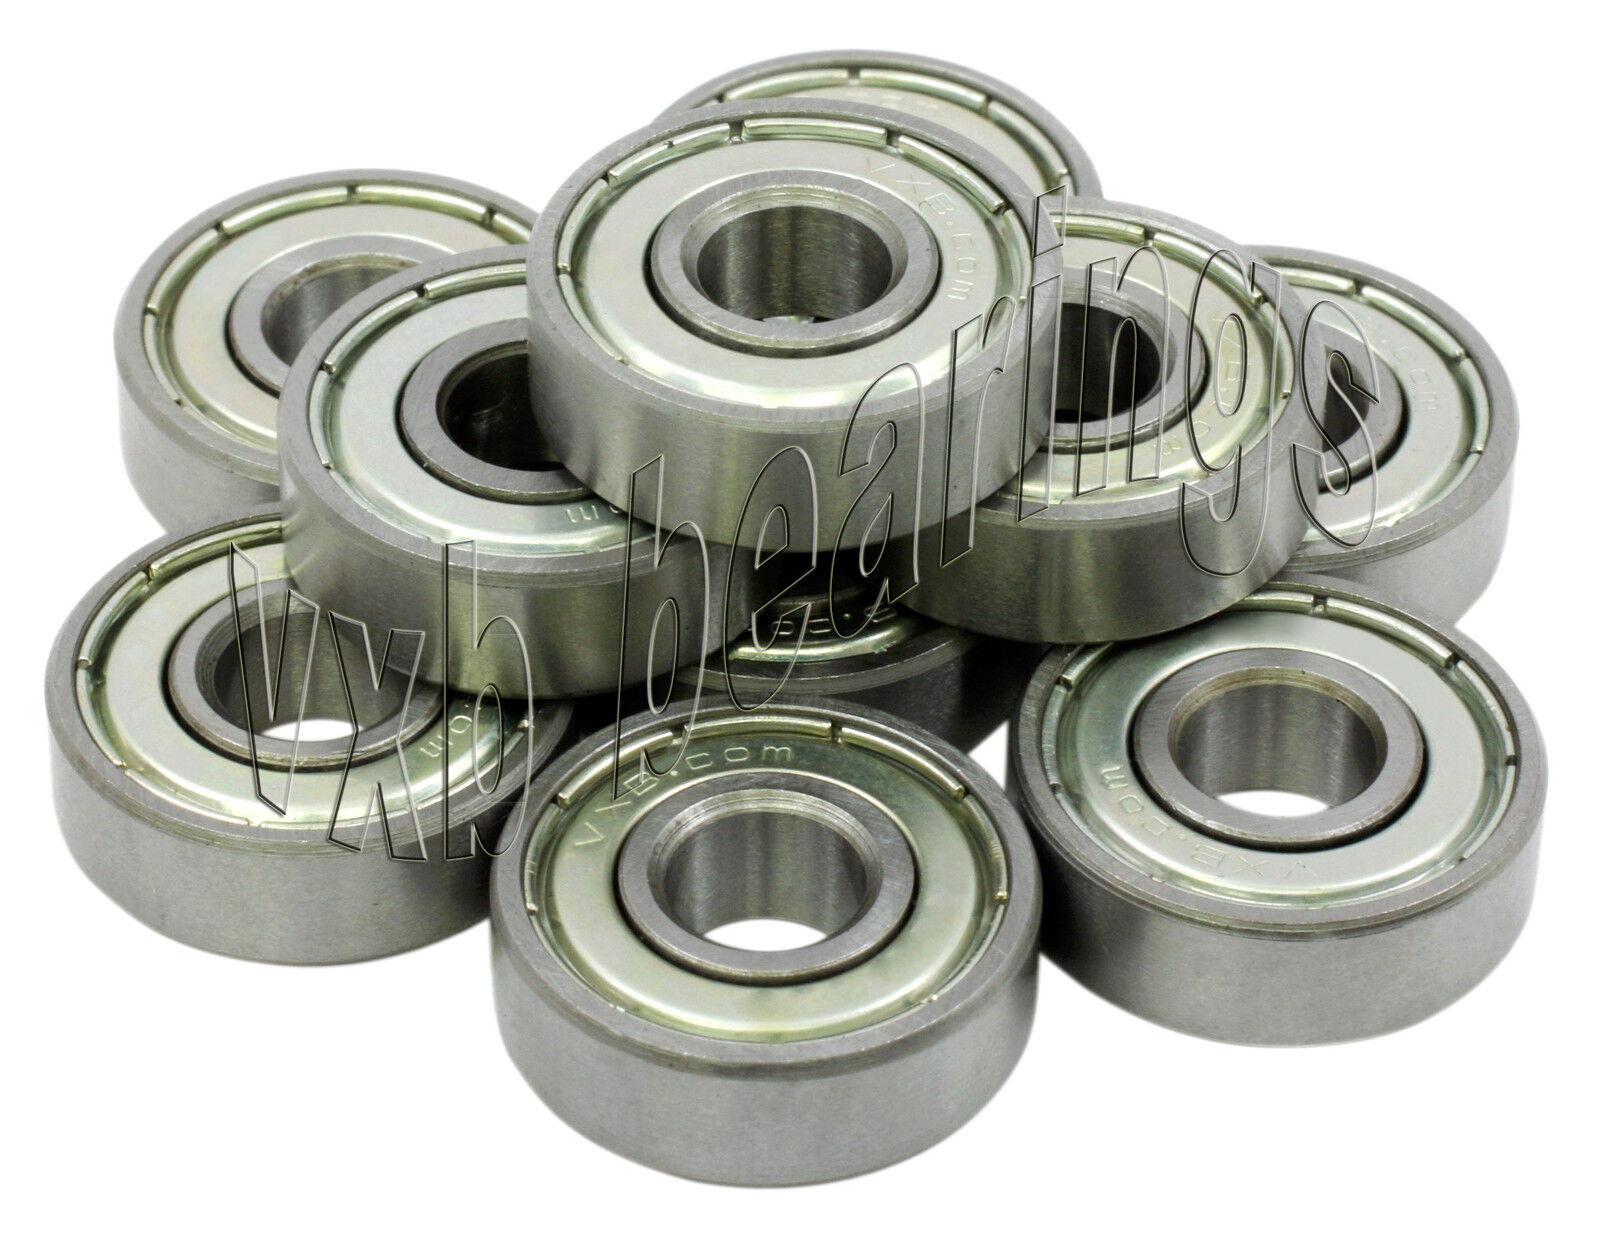 10 ABEC-5 Kugellager 5x8x2.5 Keramik Rostfrei 5x8 Mm